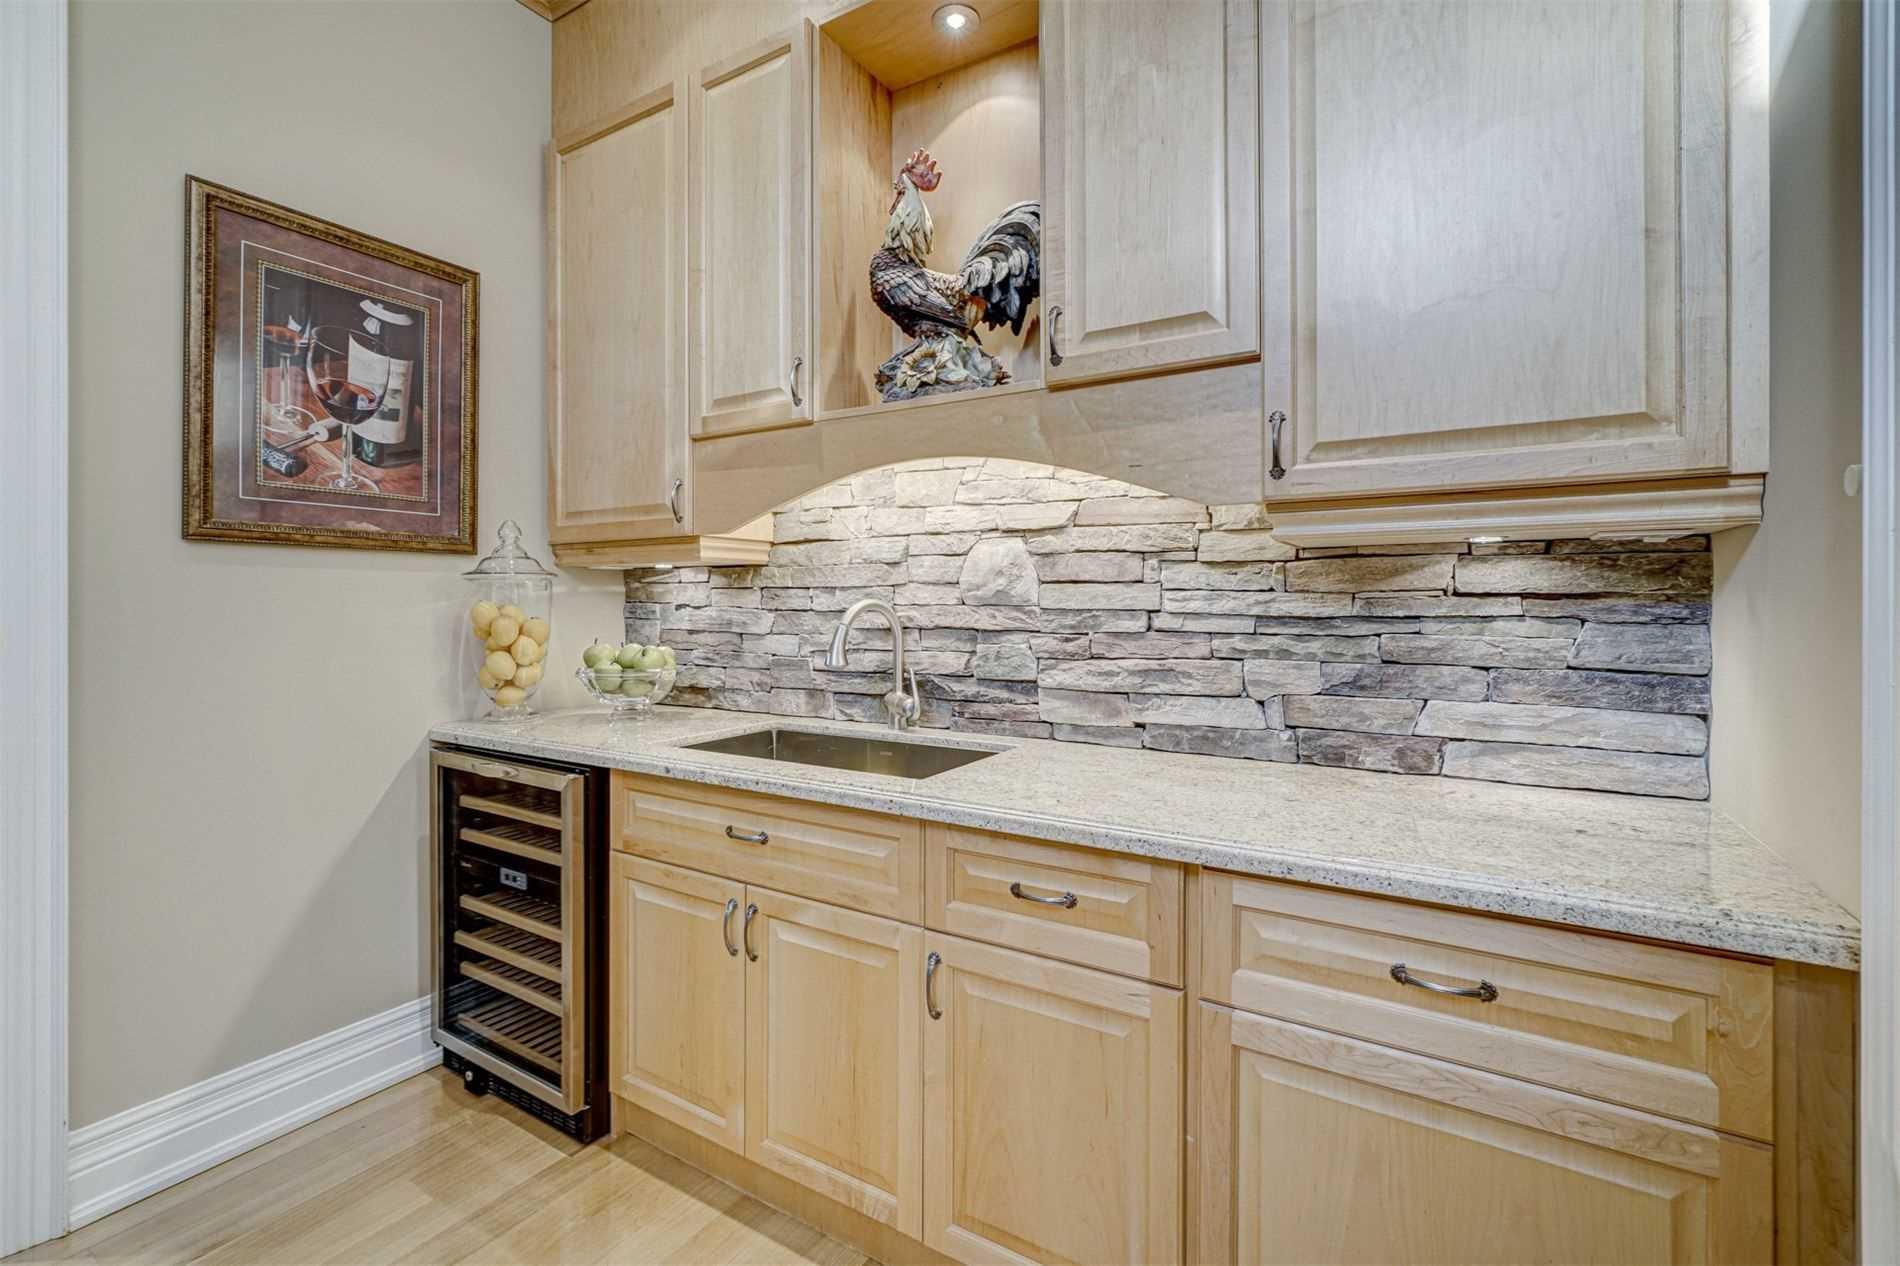 105 Duncan Rd - Langstaff Detached for sale, 4 Bedrooms (N5237187) - #20